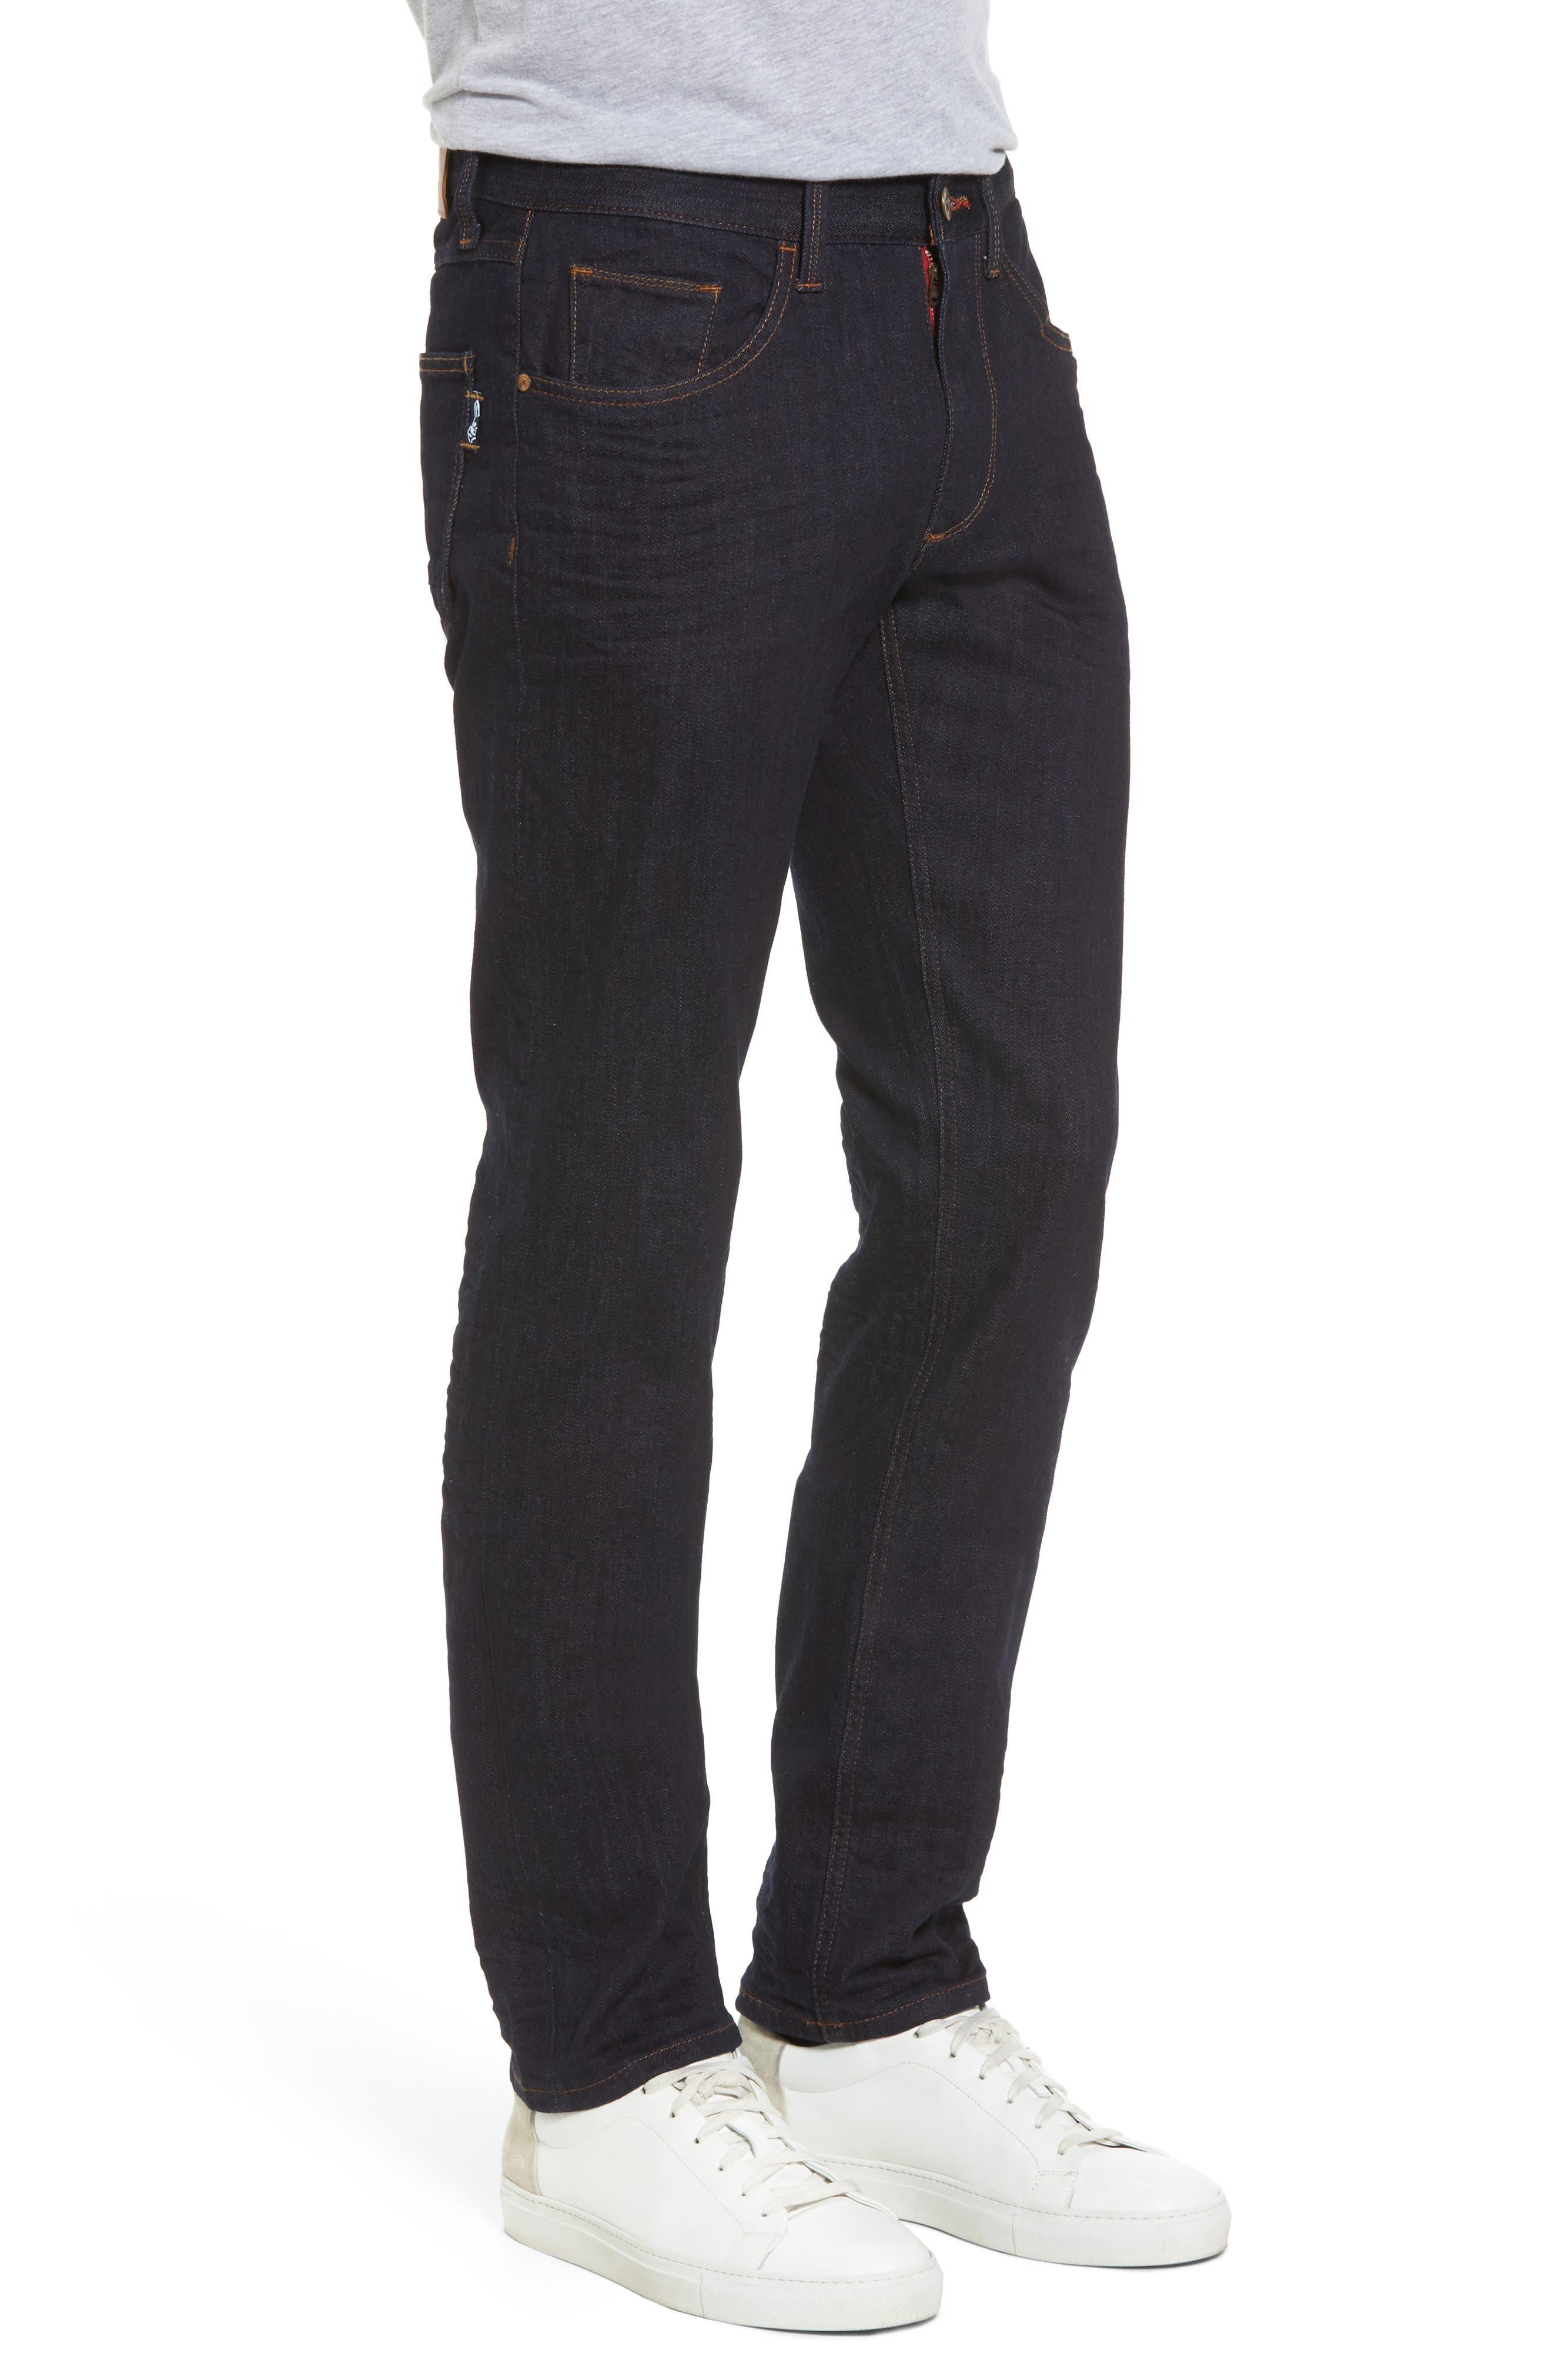 Canal Slim Fit Jeans,                             Alternate thumbnail 3, color,                             460